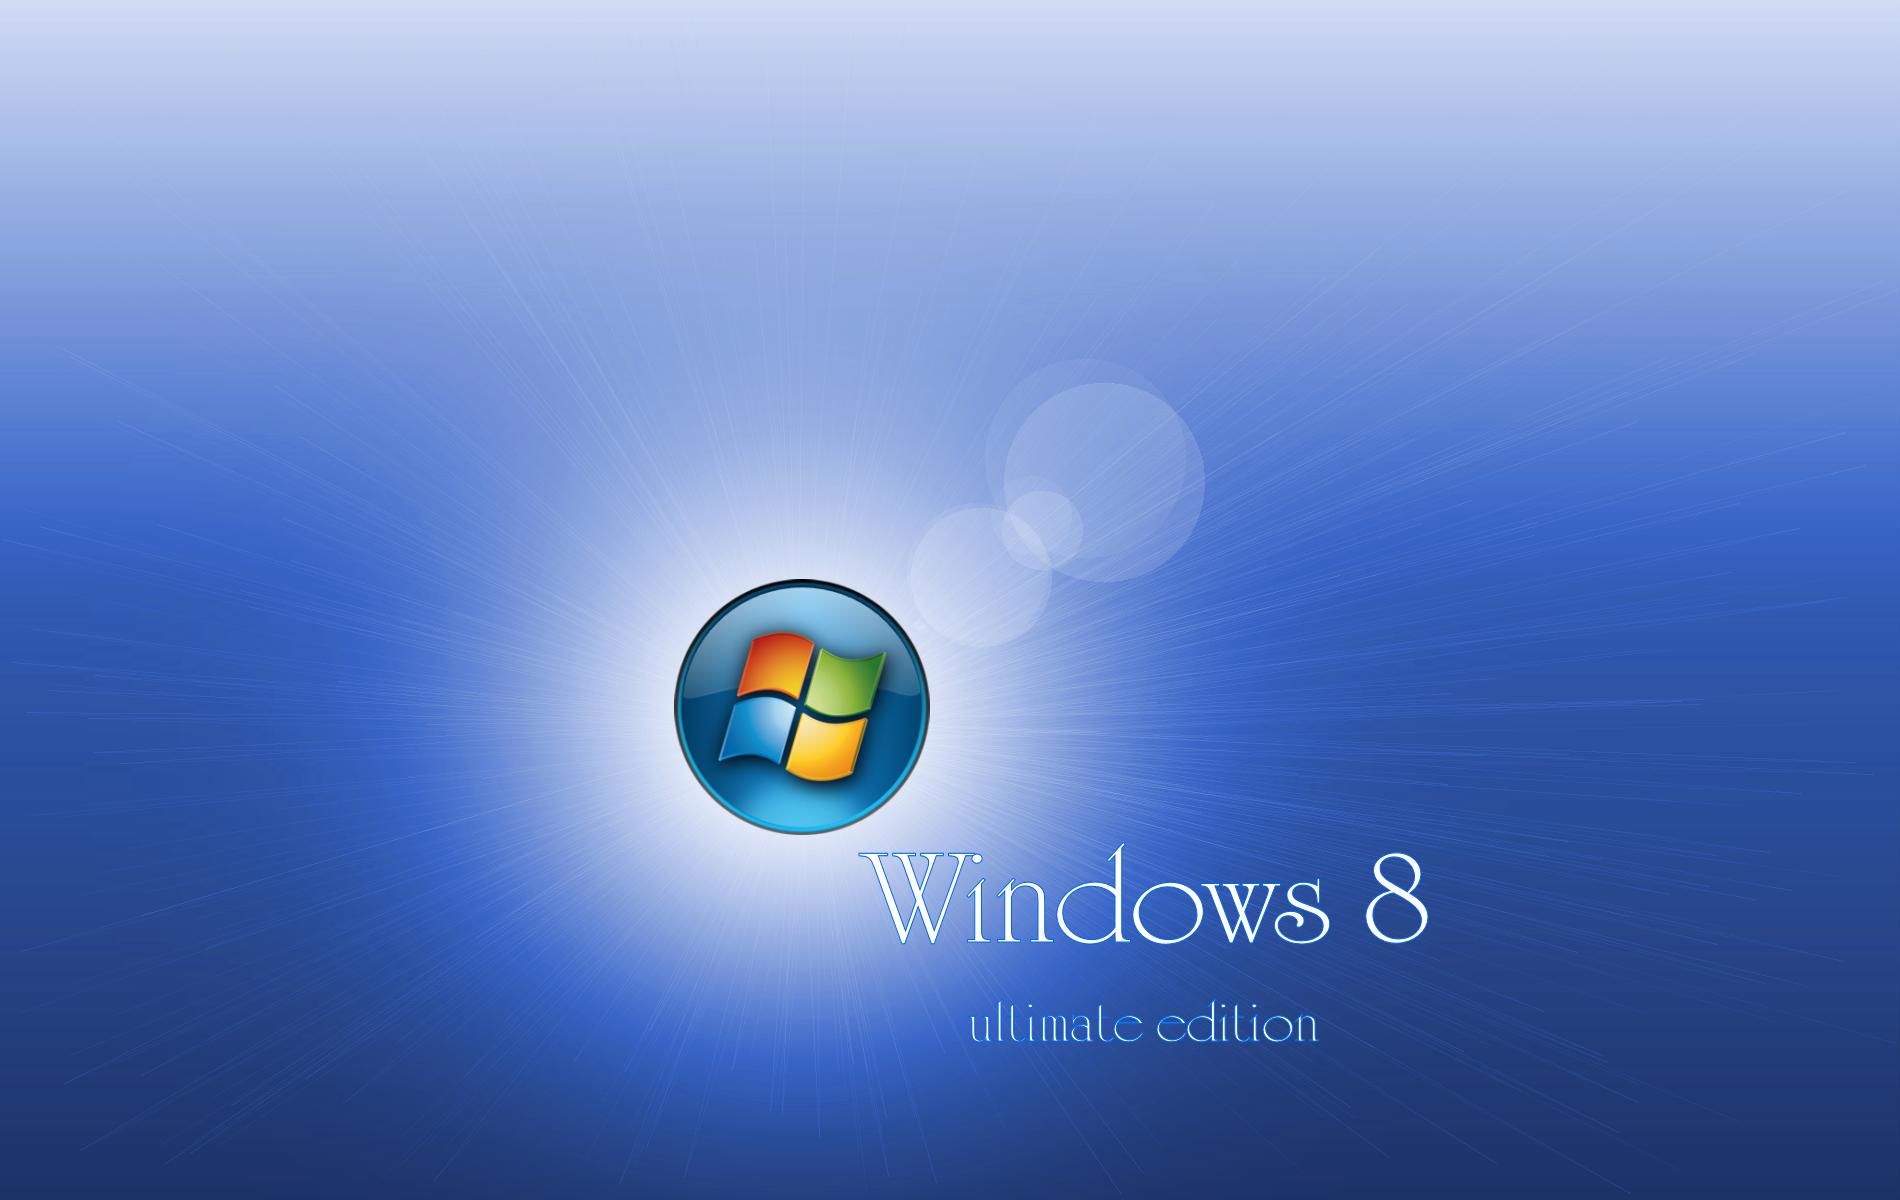 Windows 8 Wallpapers | Free Windows 8 Wallpapers Download | Desktop ...